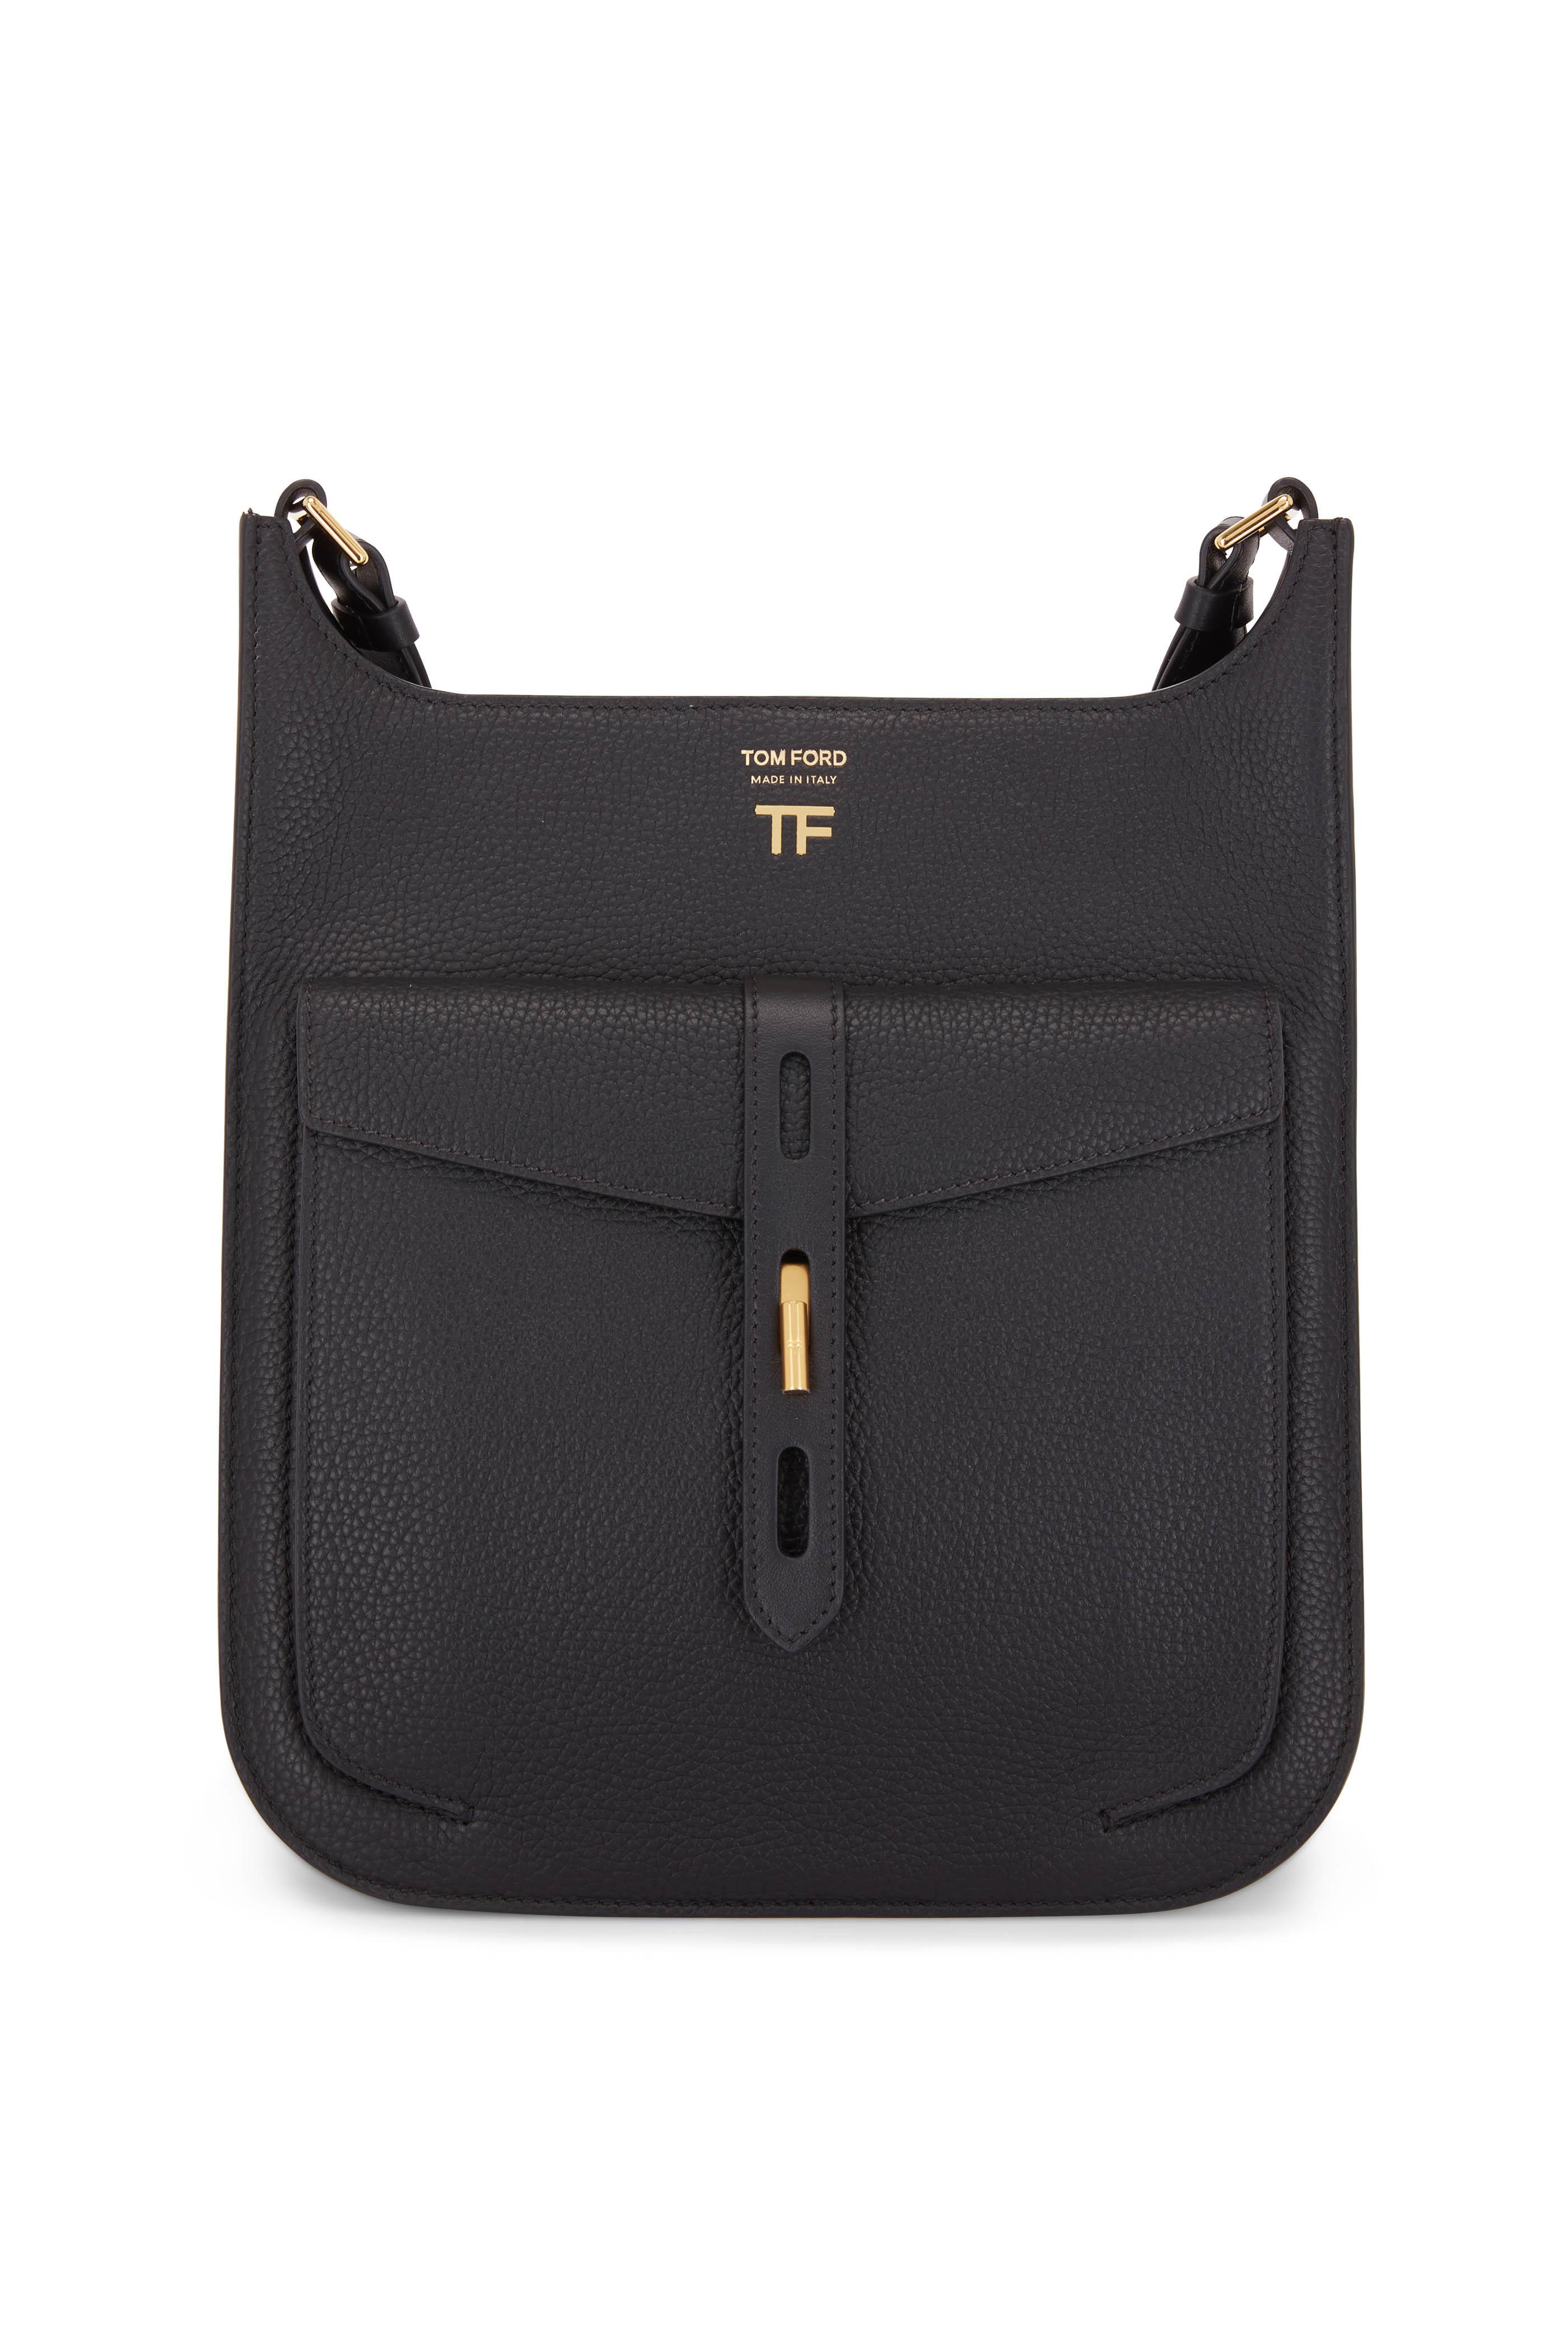 fba35dc87c64a Tom Ford - Rialto Black Grain Leather Medium Crossbody Bag ...